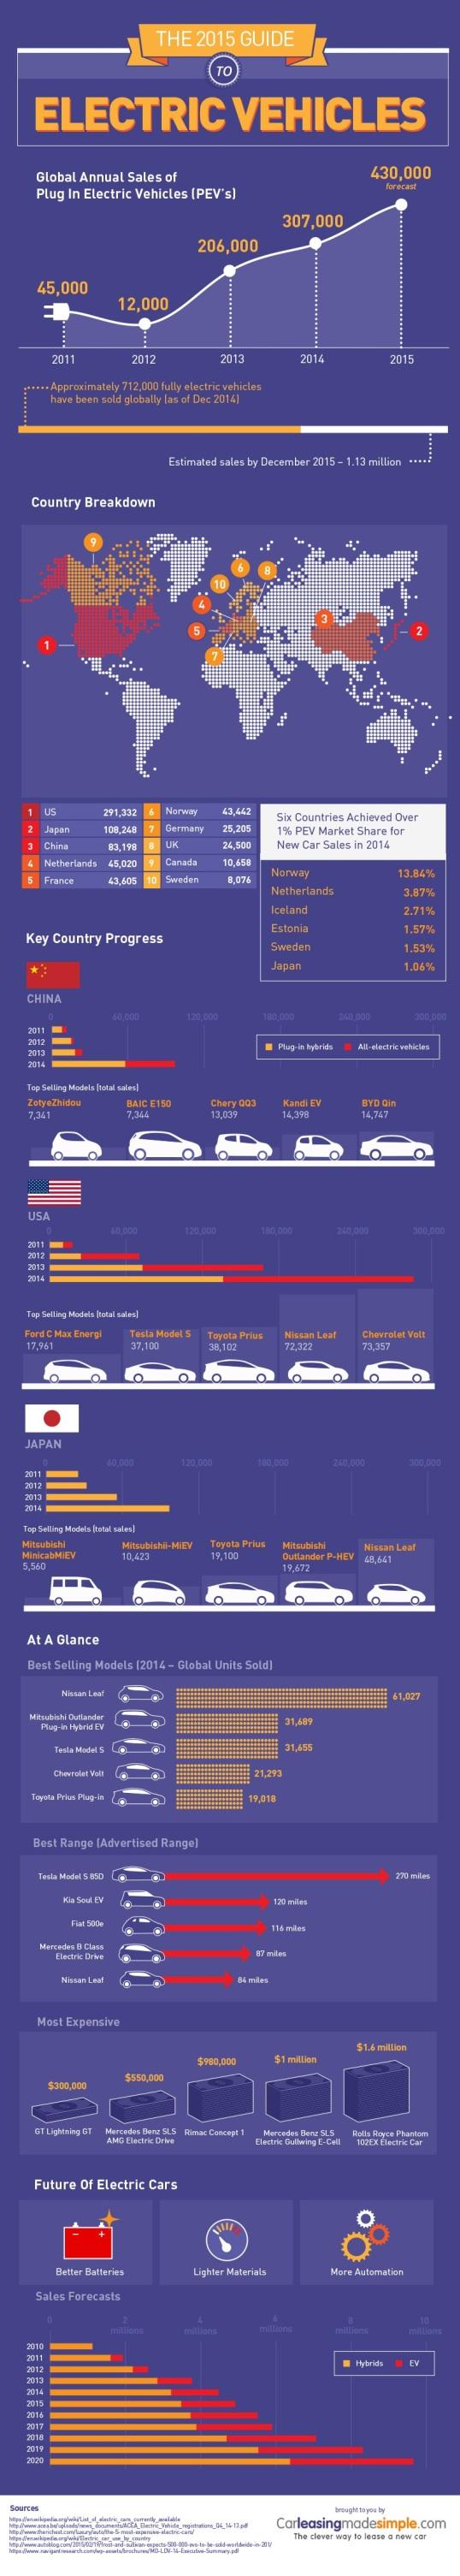 ev-infographic